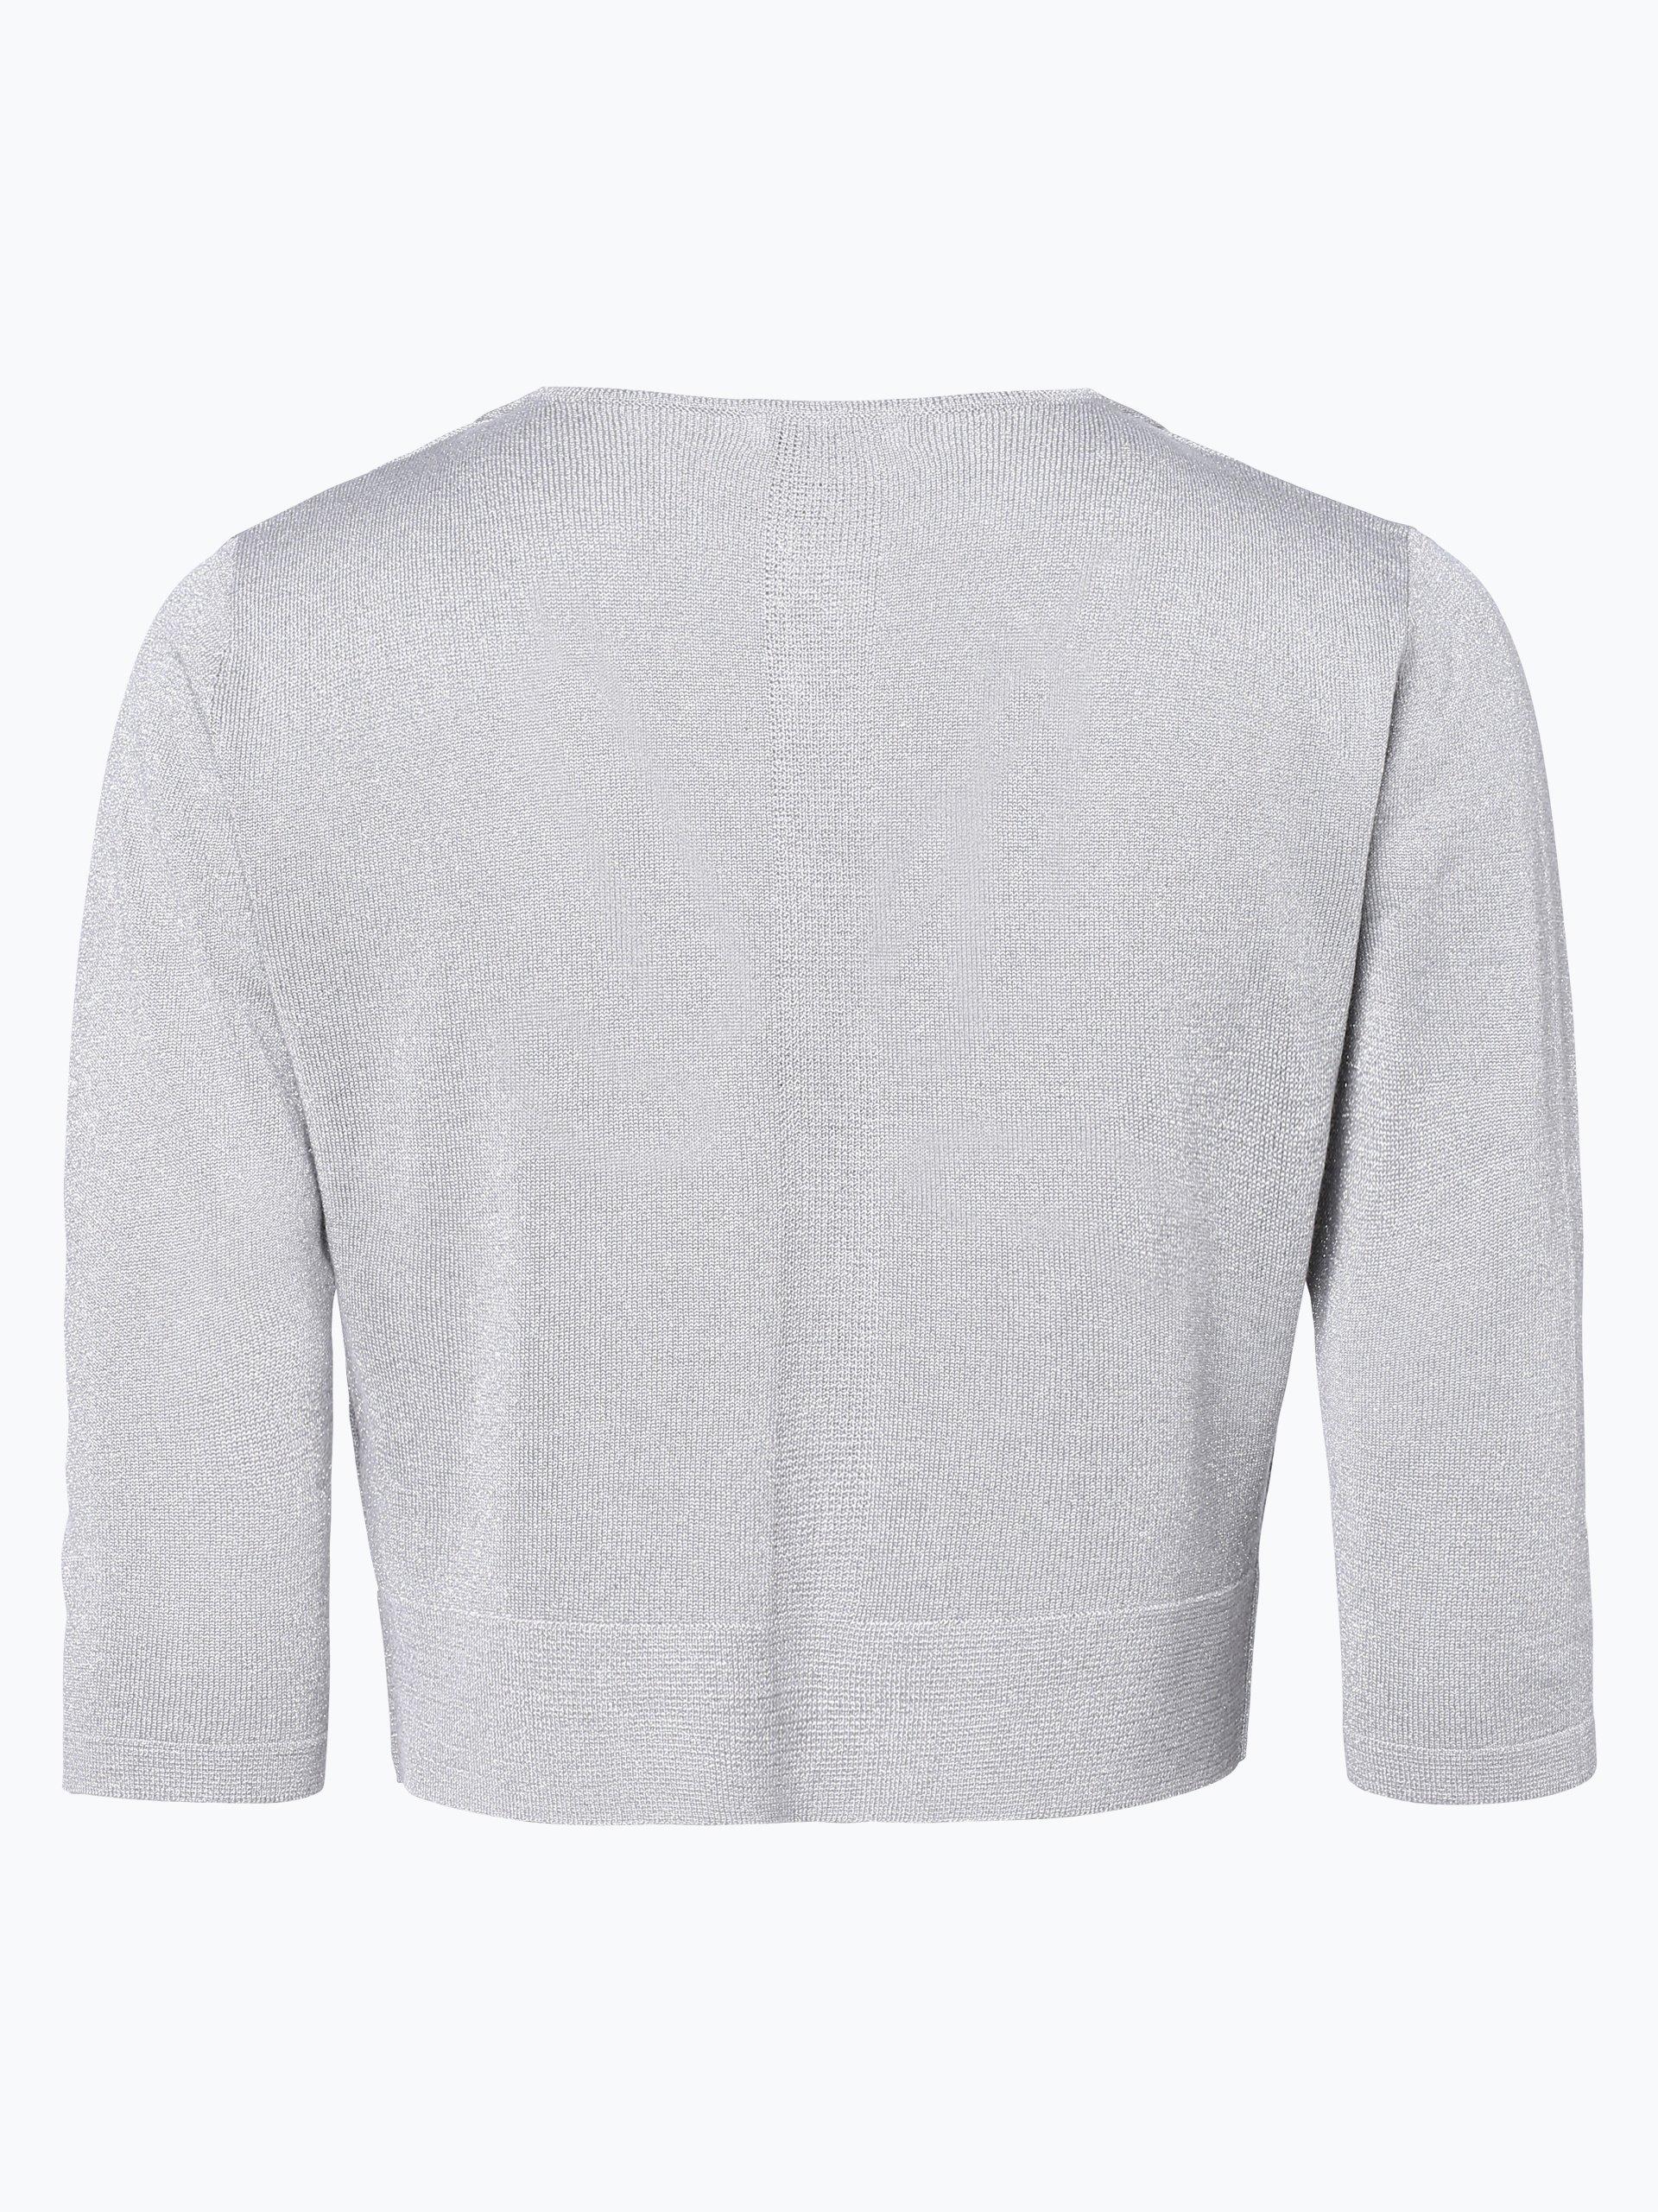 Marie lund damen bolero silber uni online kaufen for Garderobe bolero